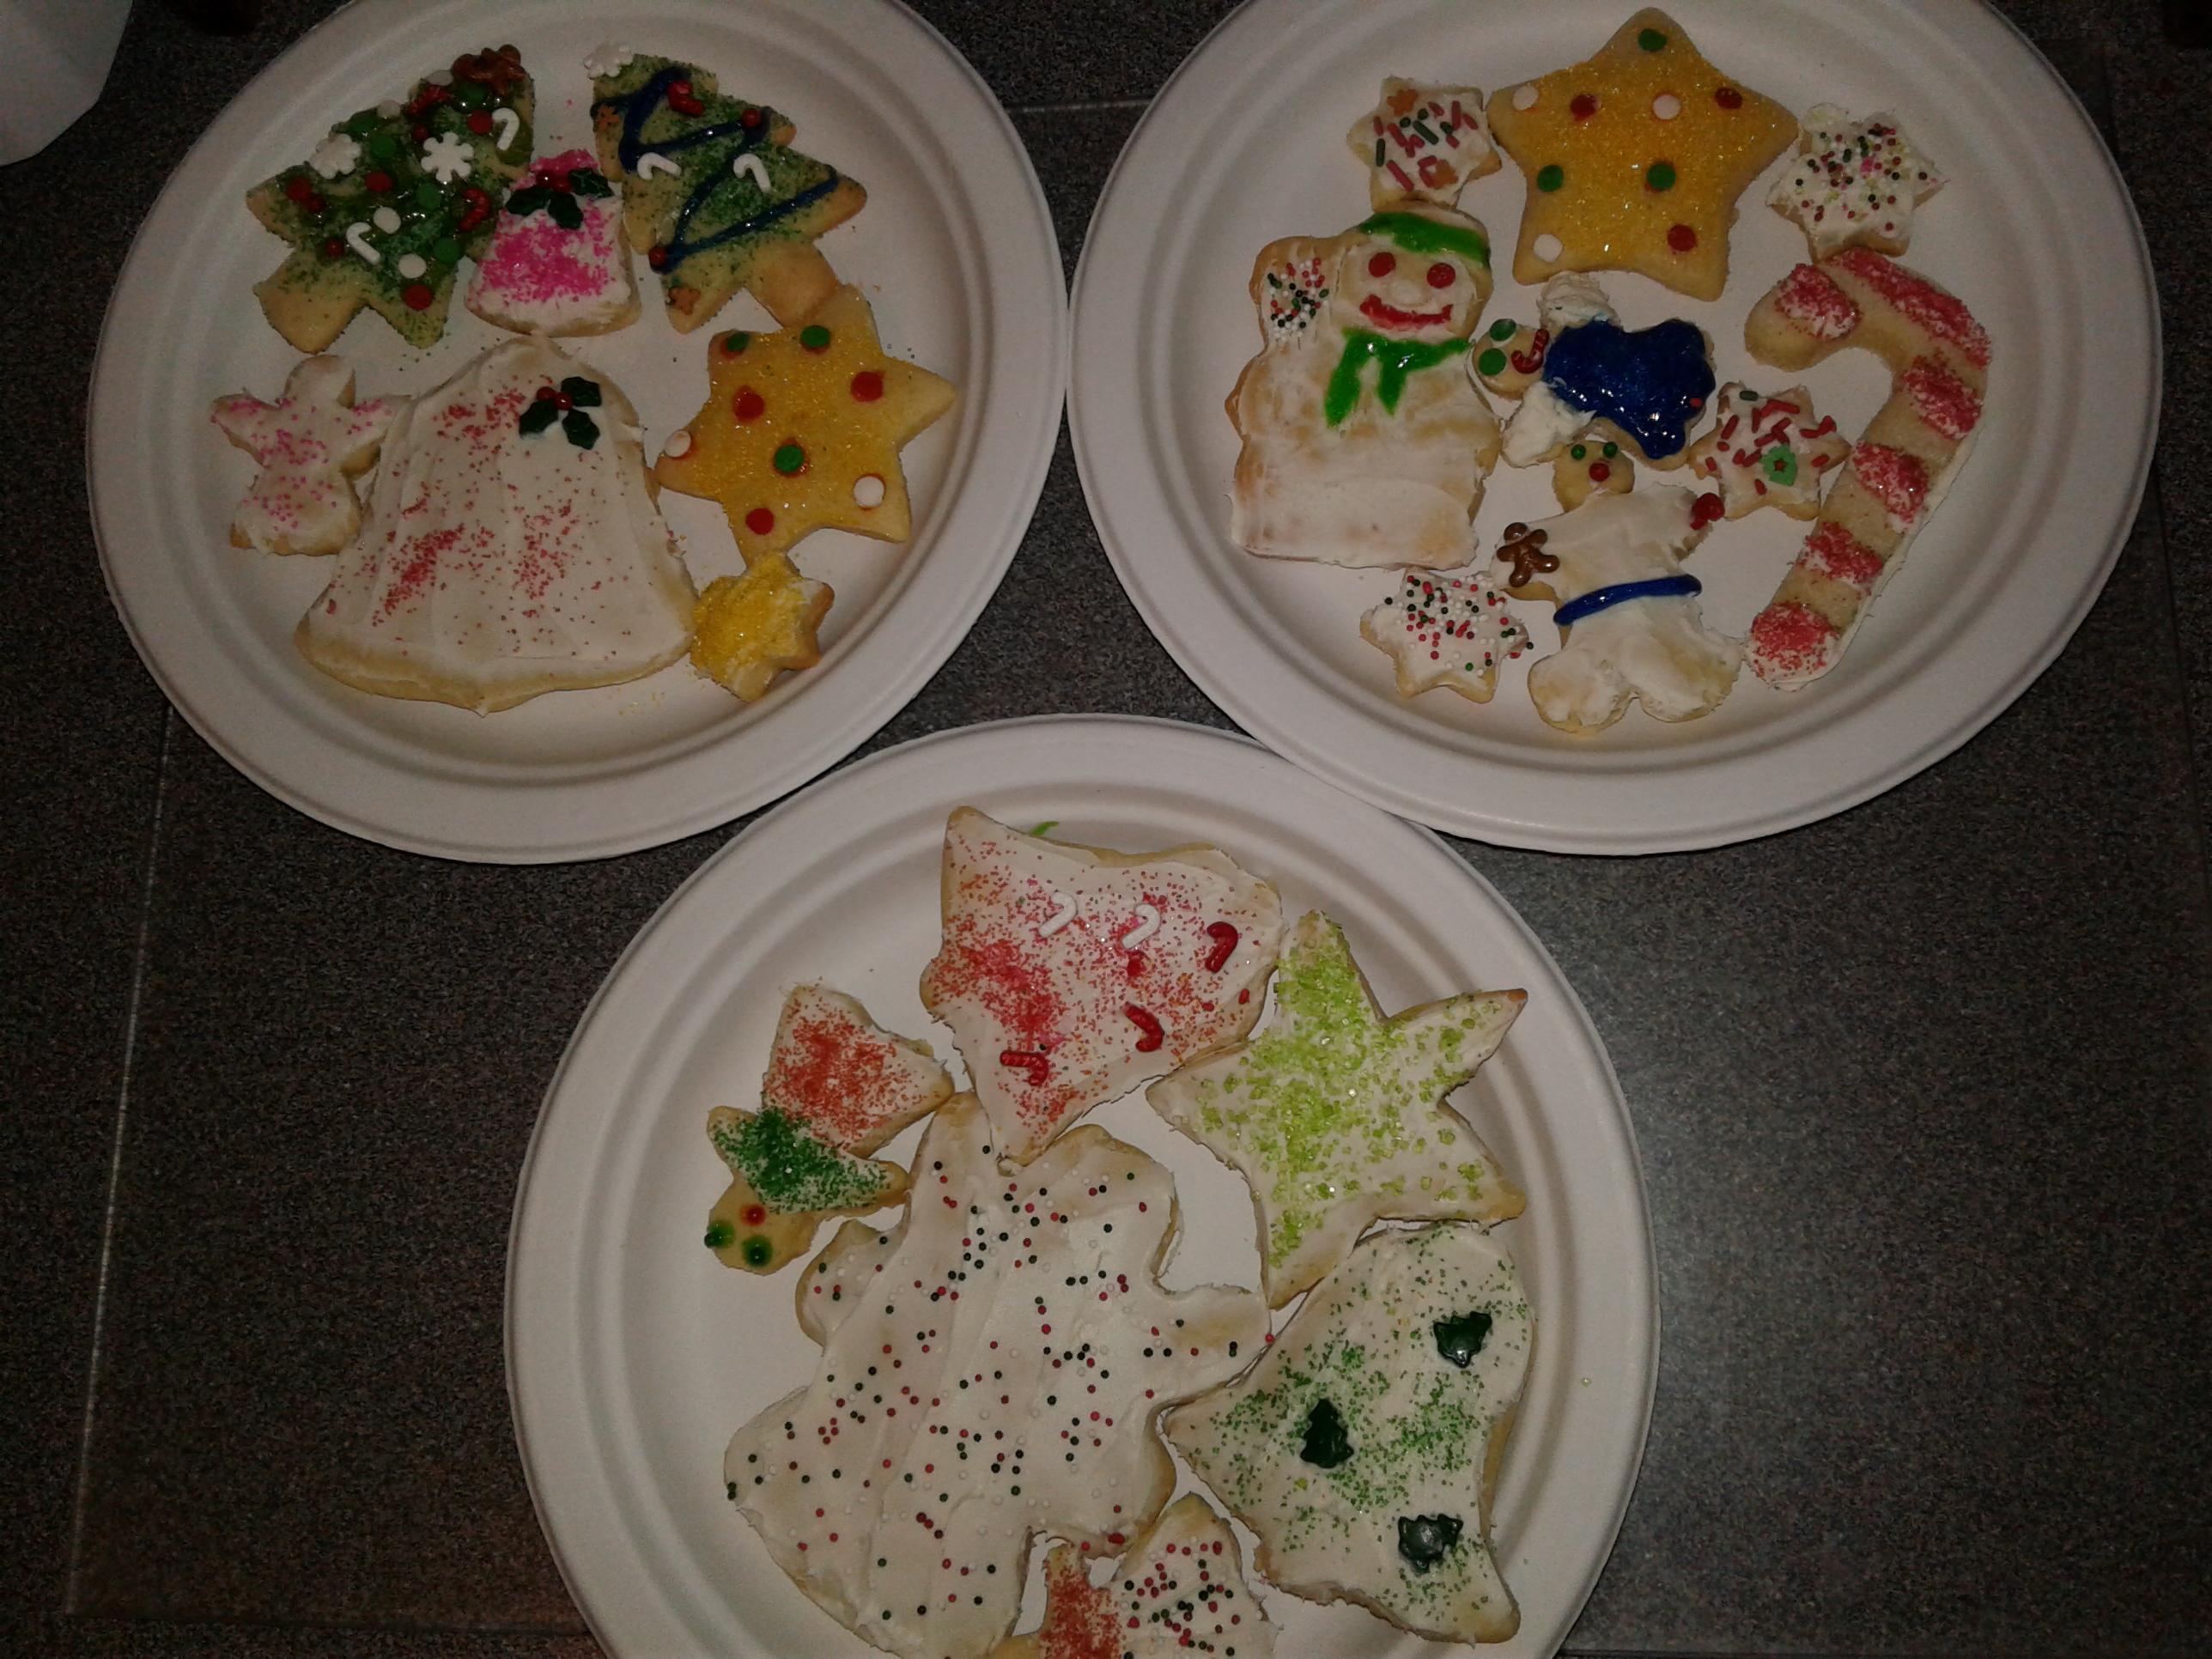 Dora's Christmas Cookies themardi@gmail.com